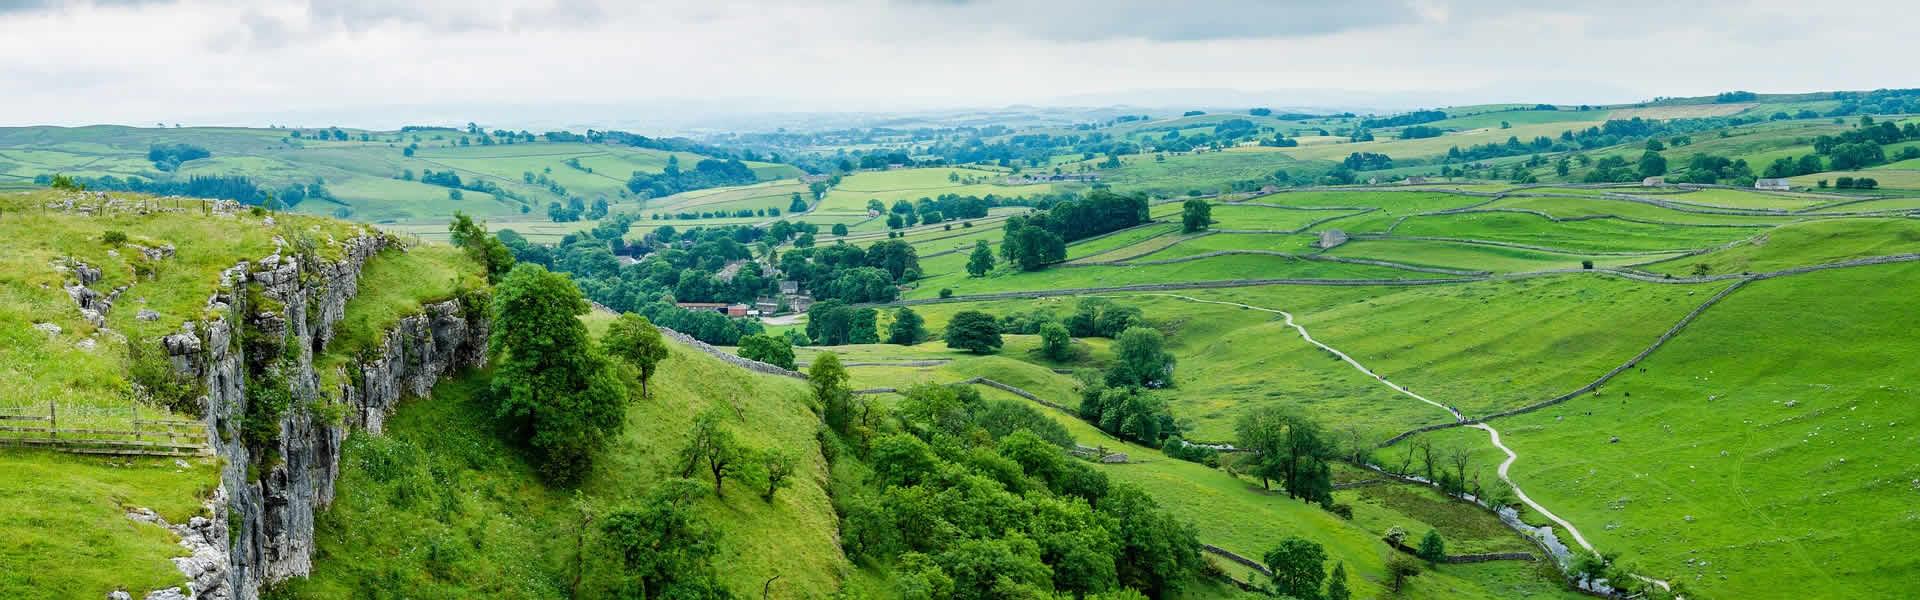 Malham Cove Yorkshire Panorama Valley United Kingdom